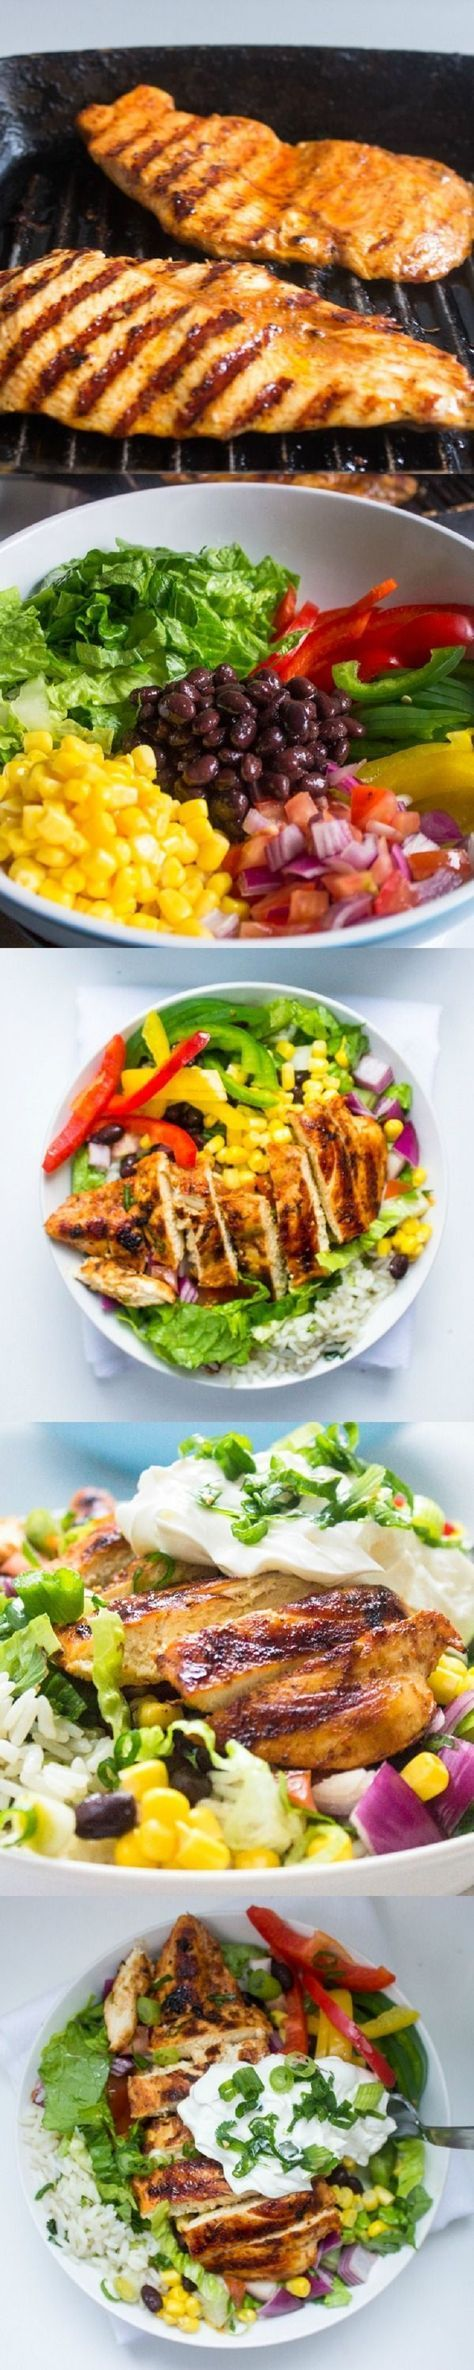 Chipotle's Chicken Burrito Bowl with Cilantro Lime Rice - 15 Most Influential Chipotle Copycat Recipes | GleamItUp